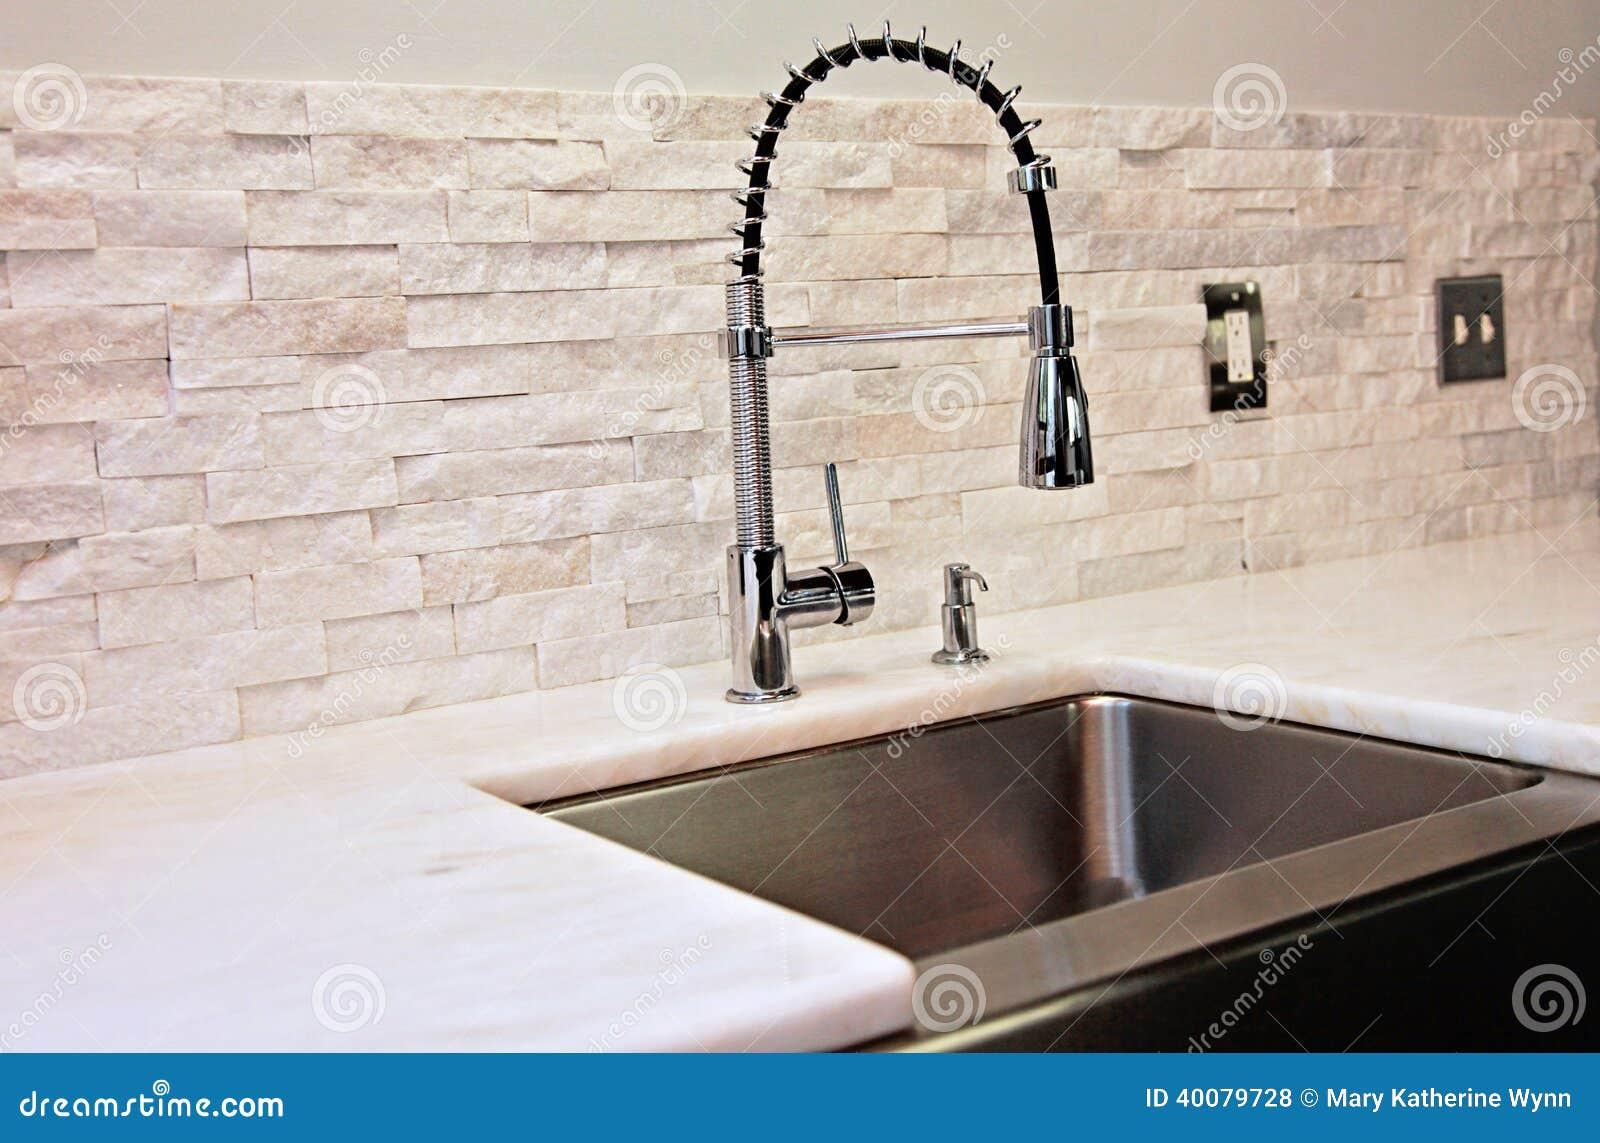 Industrial Kitchen Sink Faucet